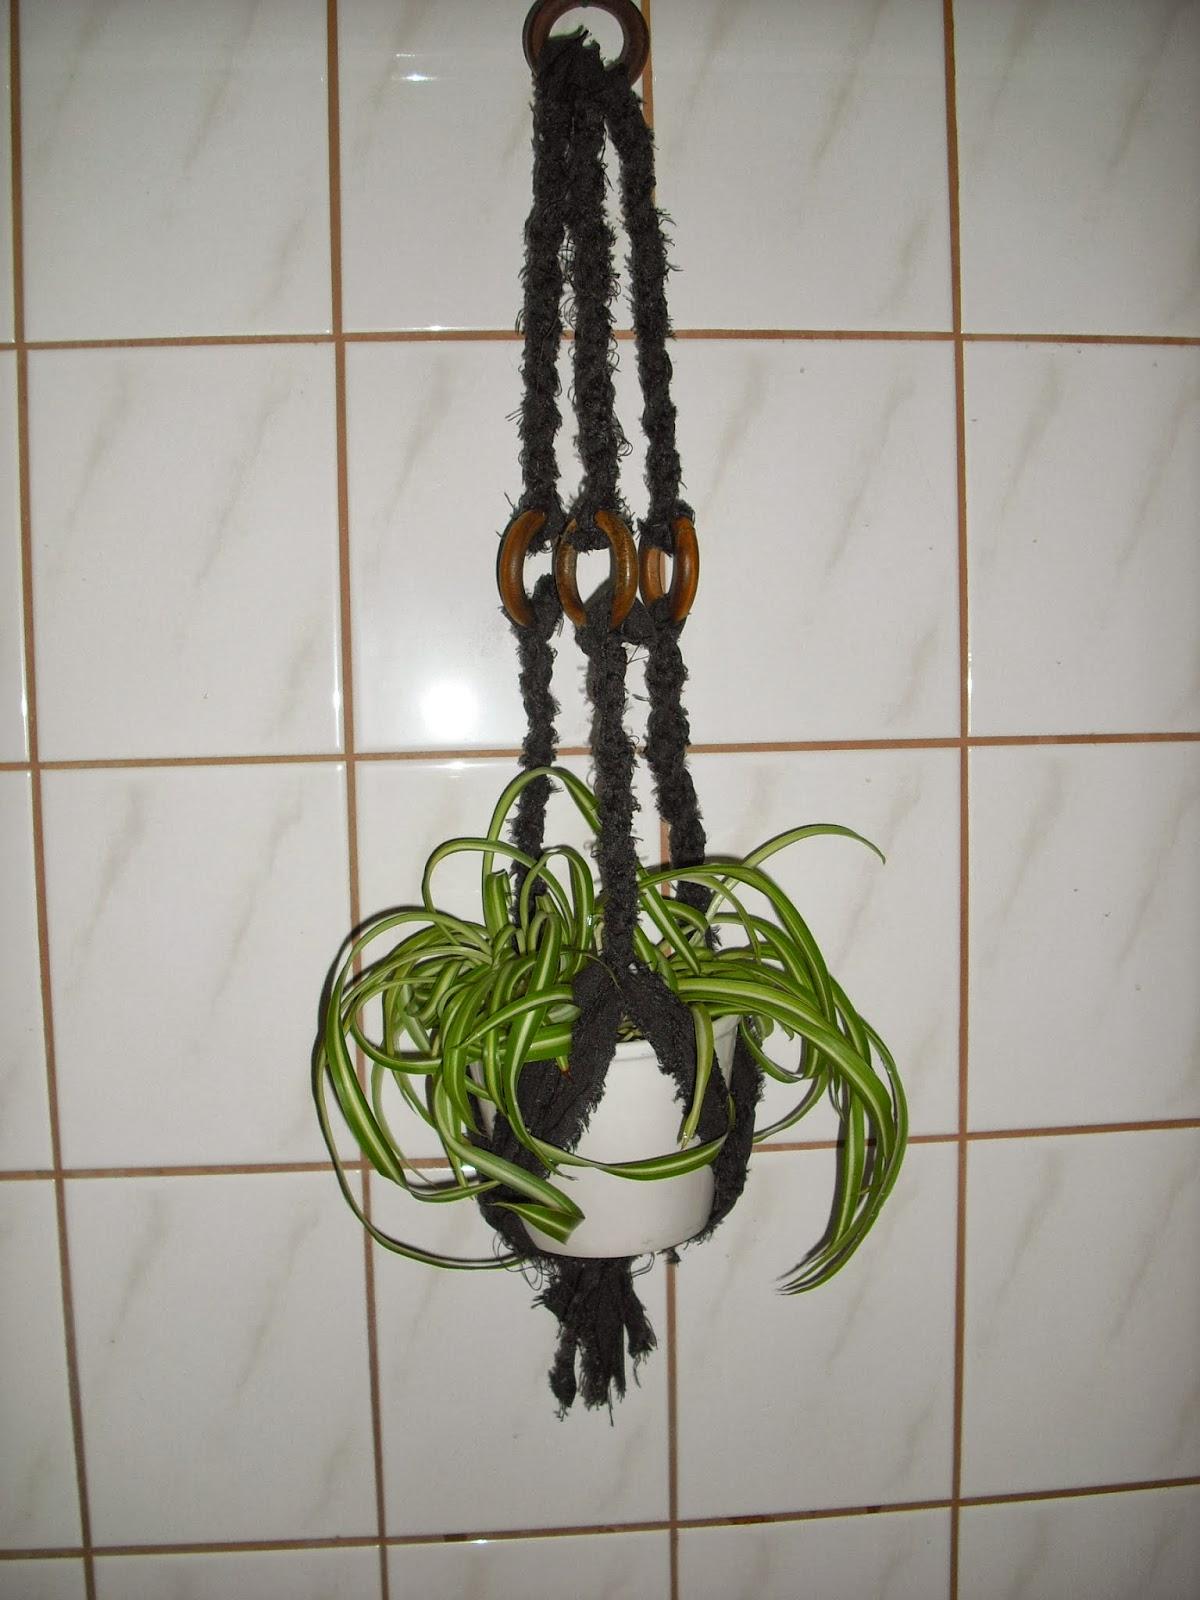 h kel dies h kel das upcycling aus alten gardinen hose. Black Bedroom Furniture Sets. Home Design Ideas